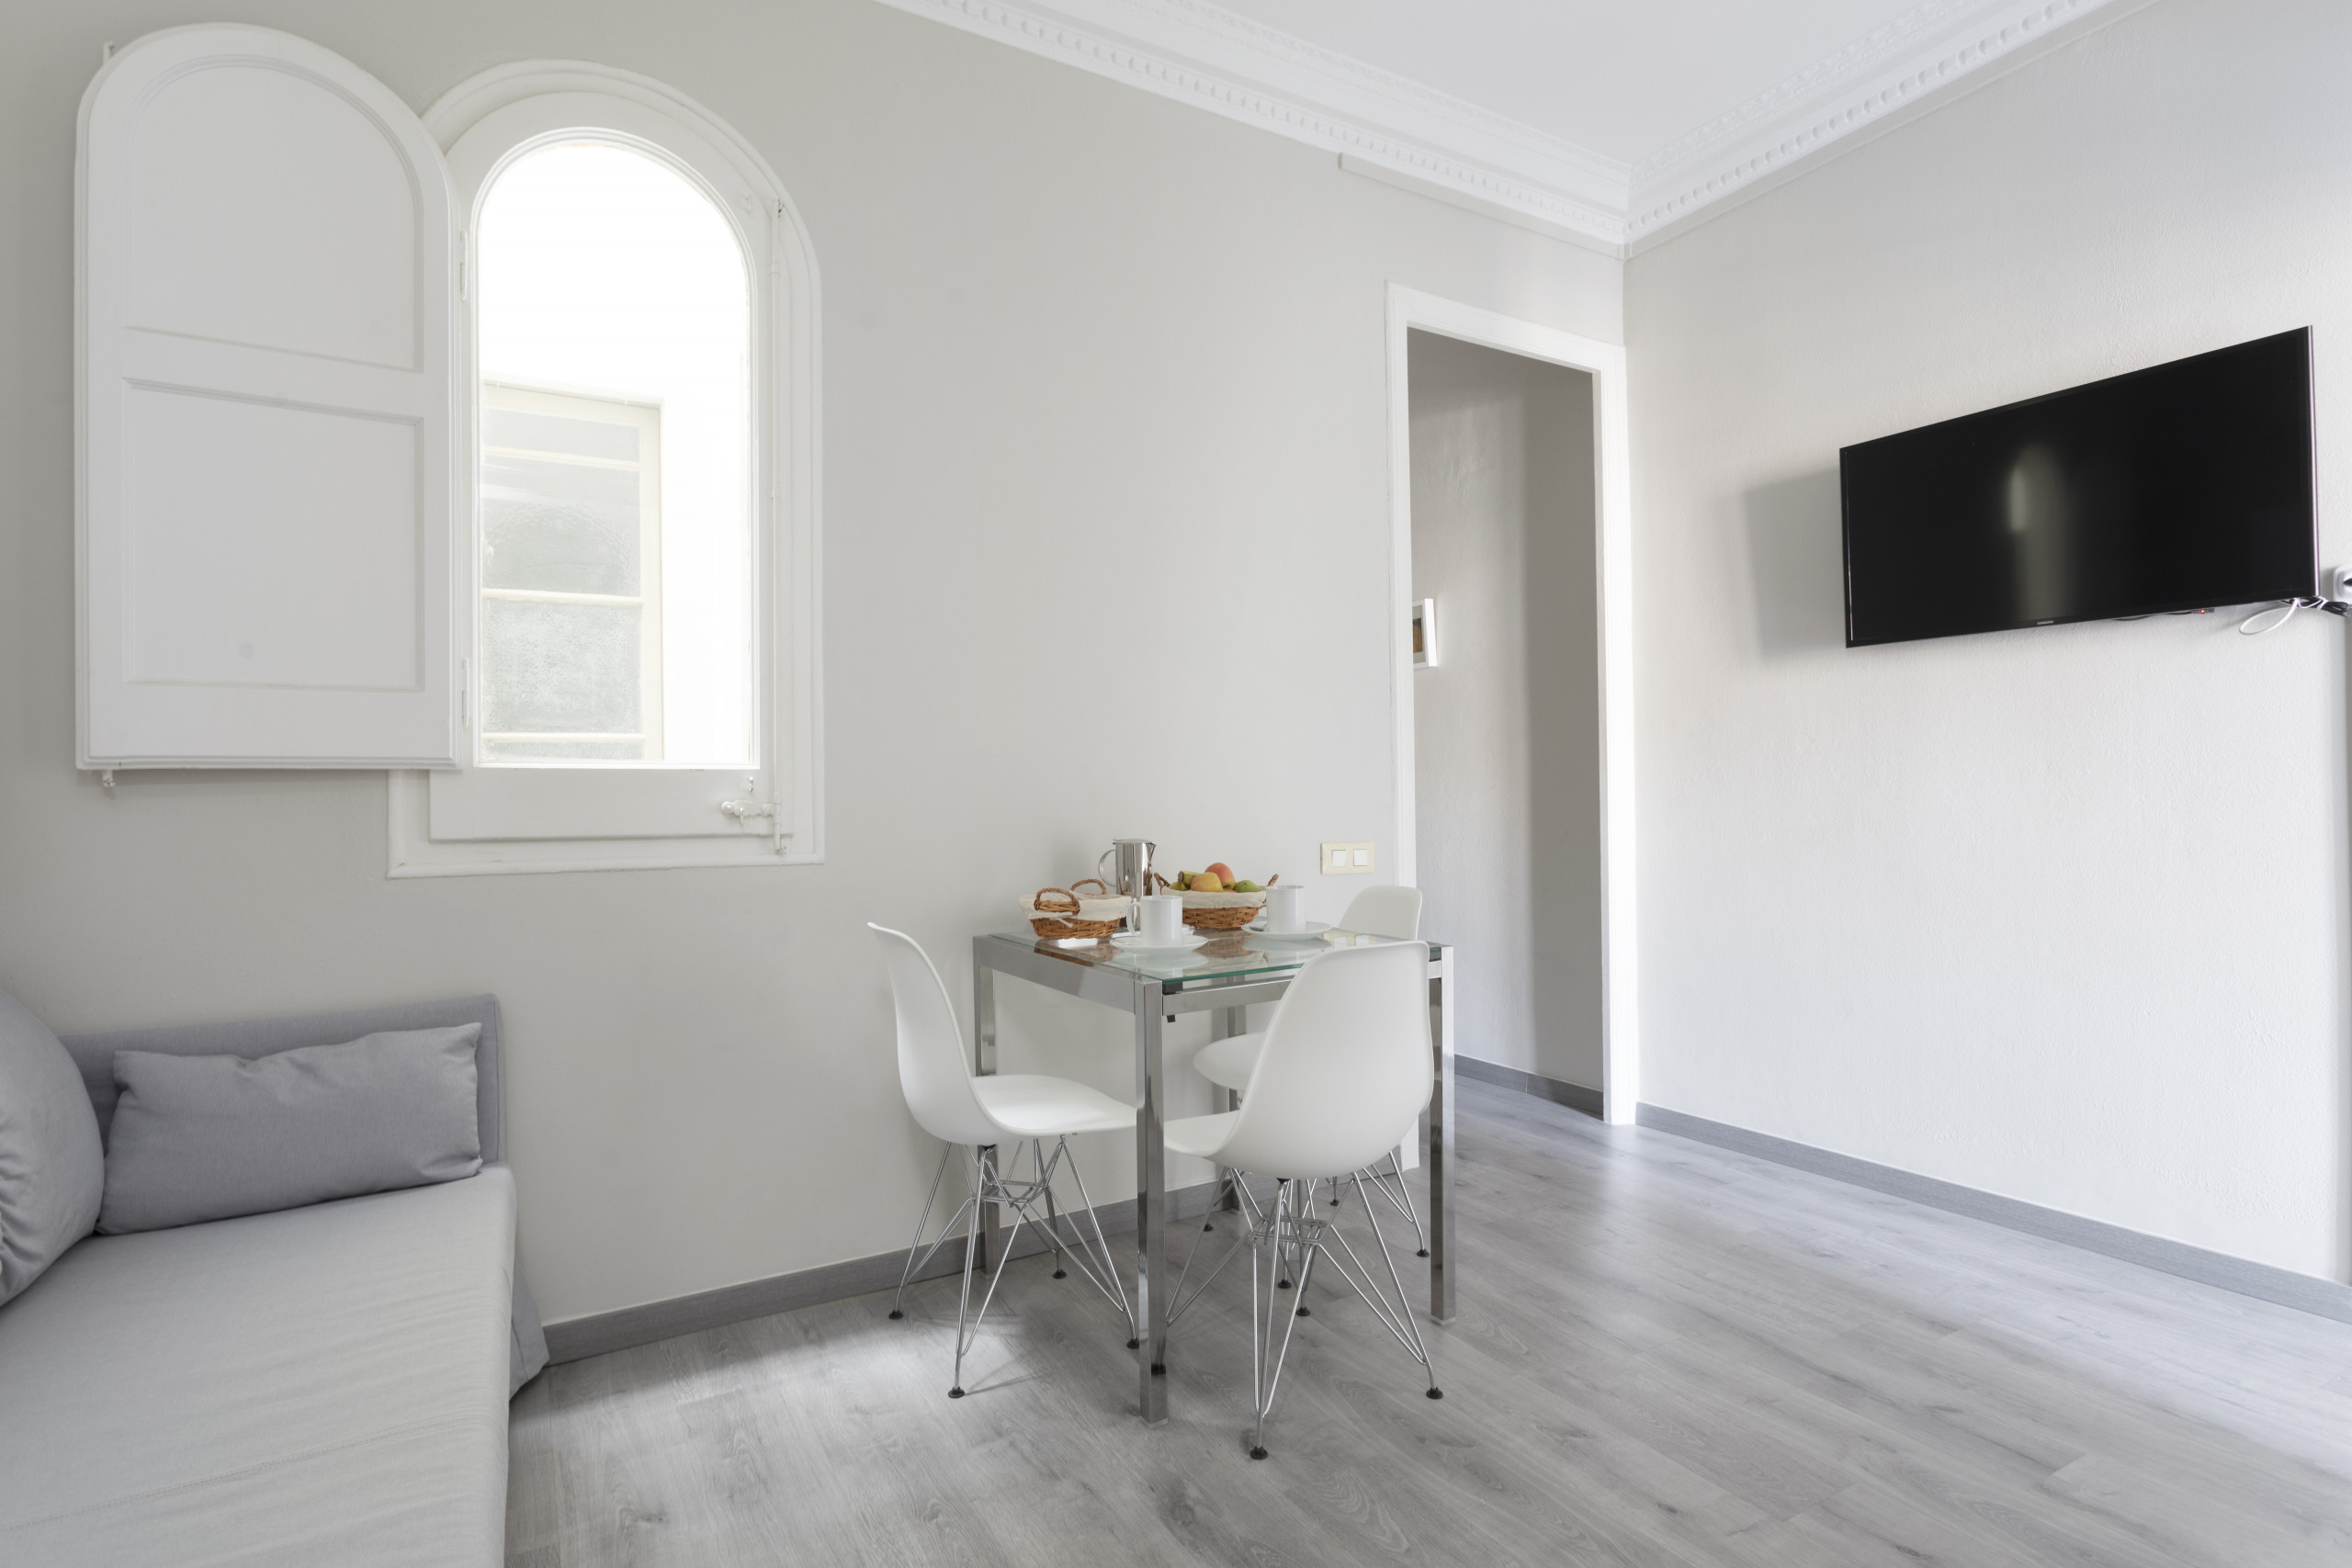 BARCELONA FIRA FAMILY - Apartments in Barcelona